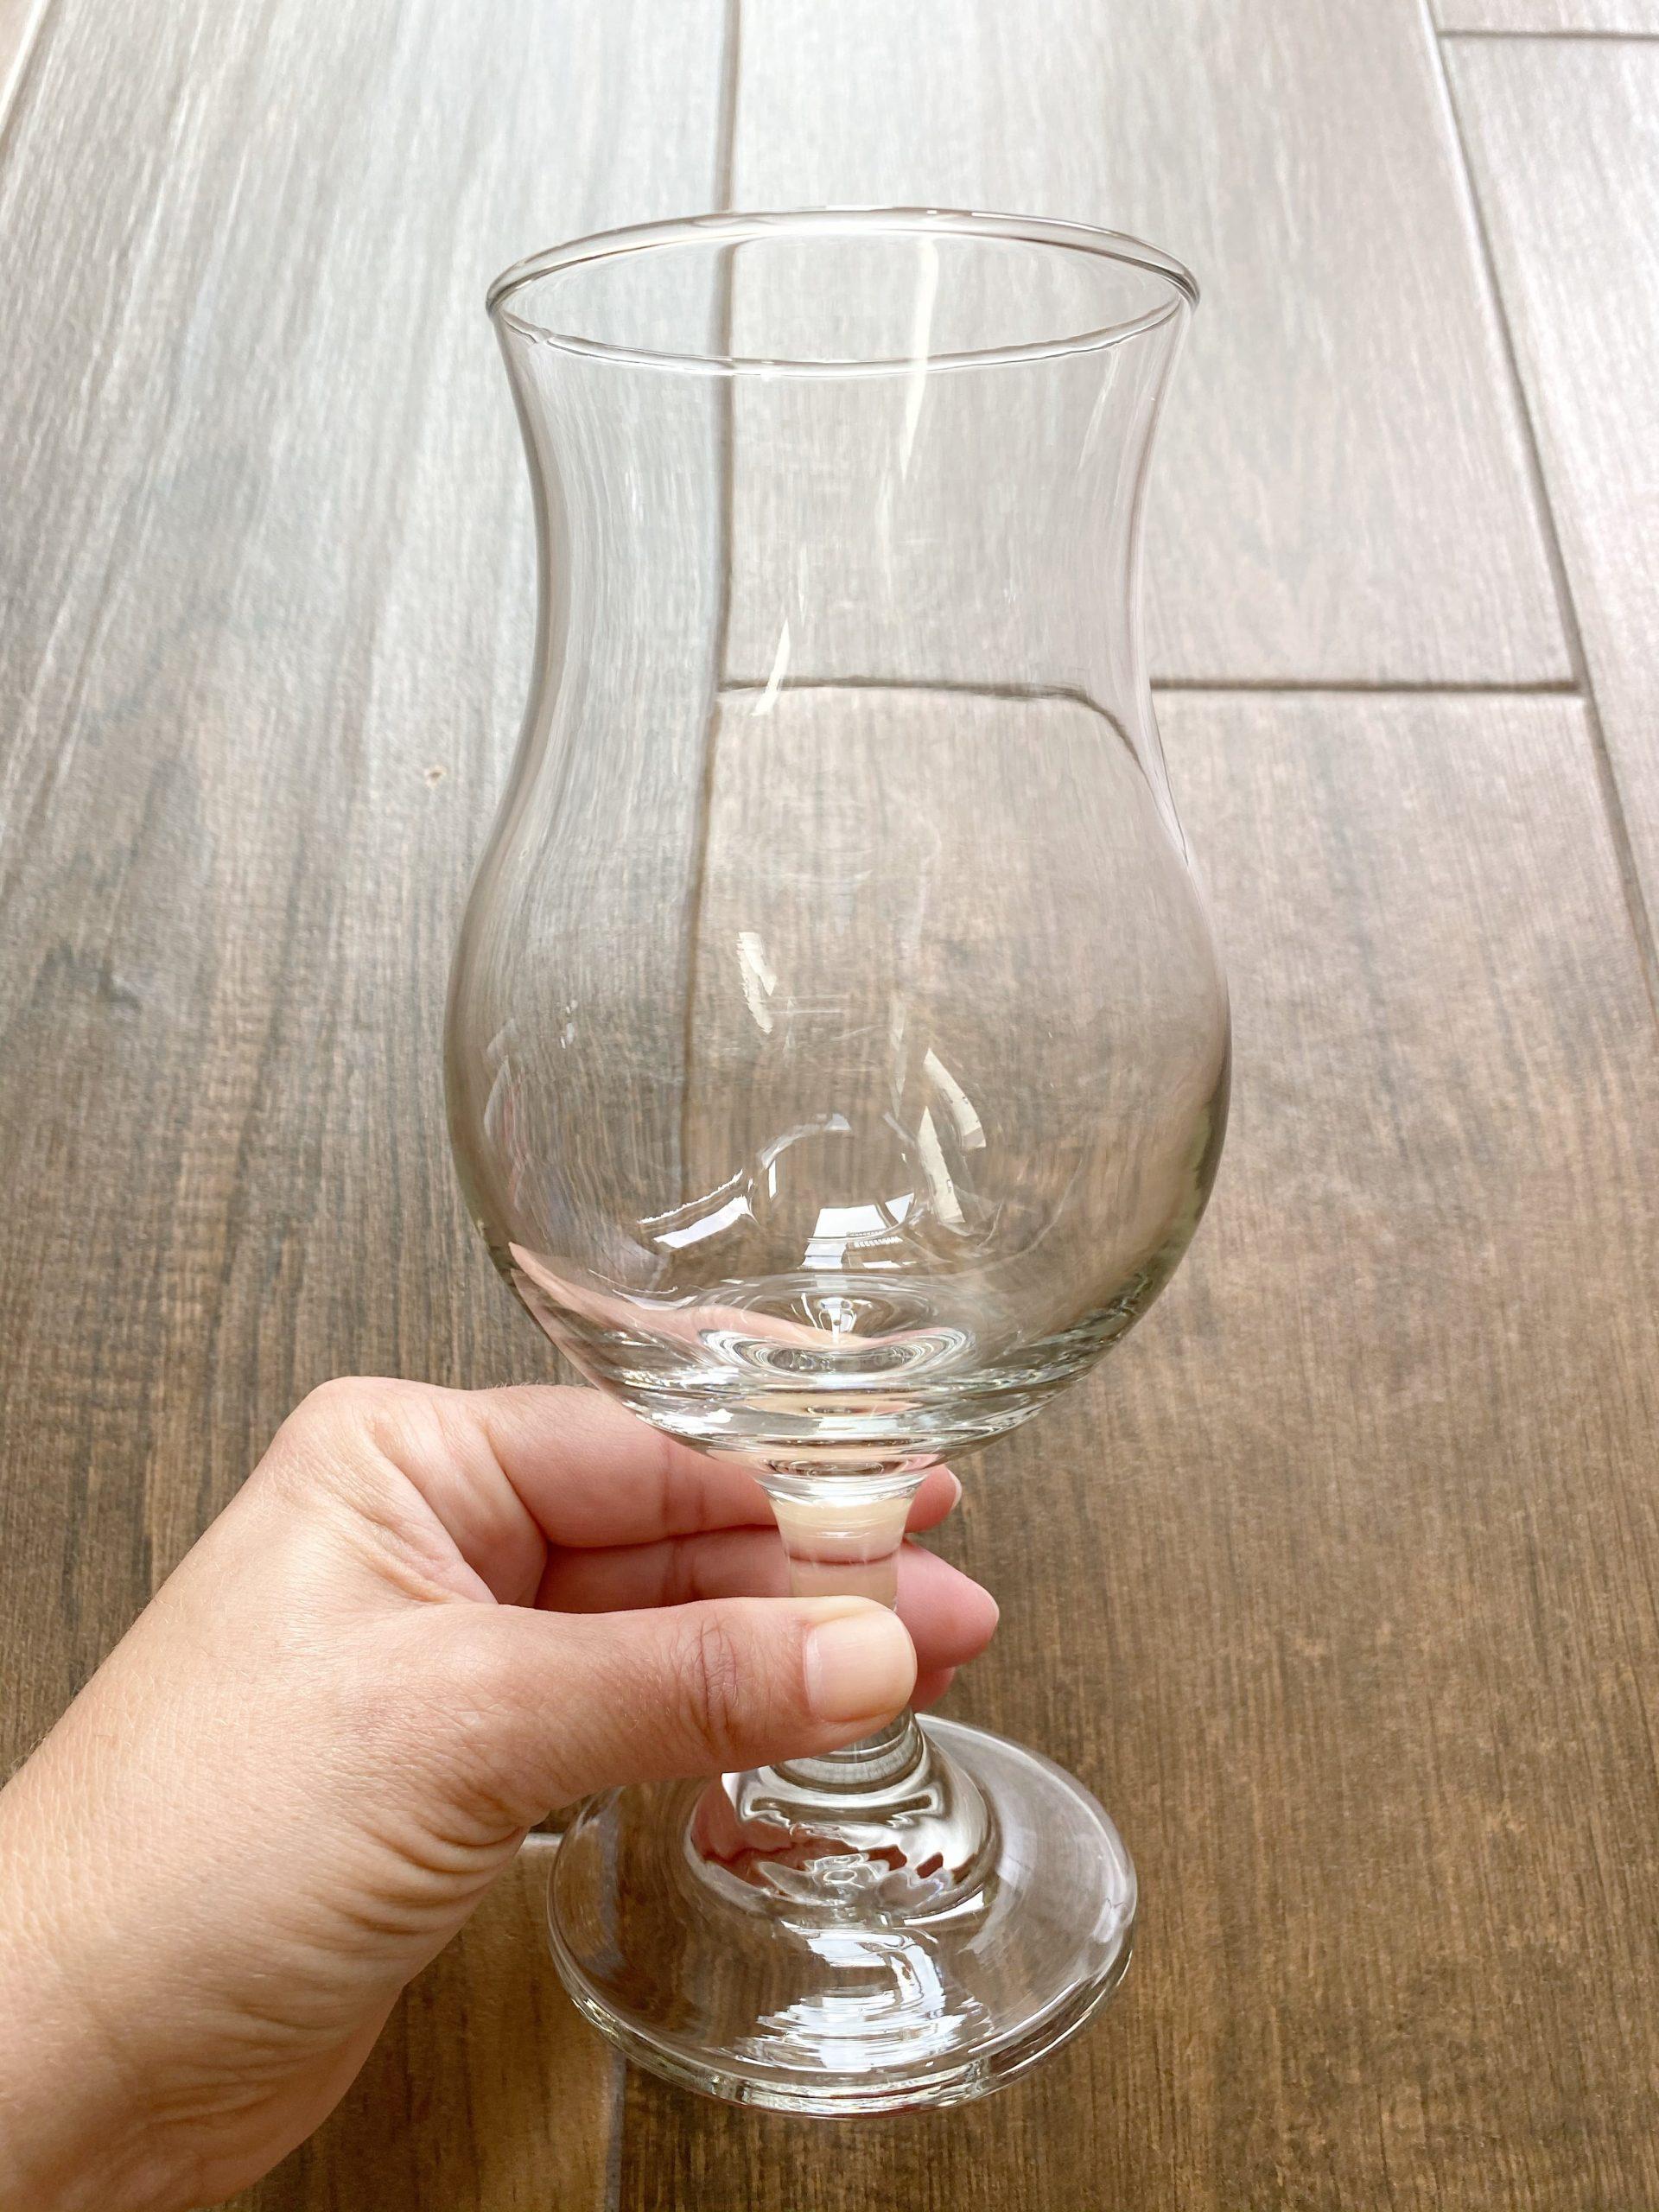 daiquiri glasses from Dollar Tree